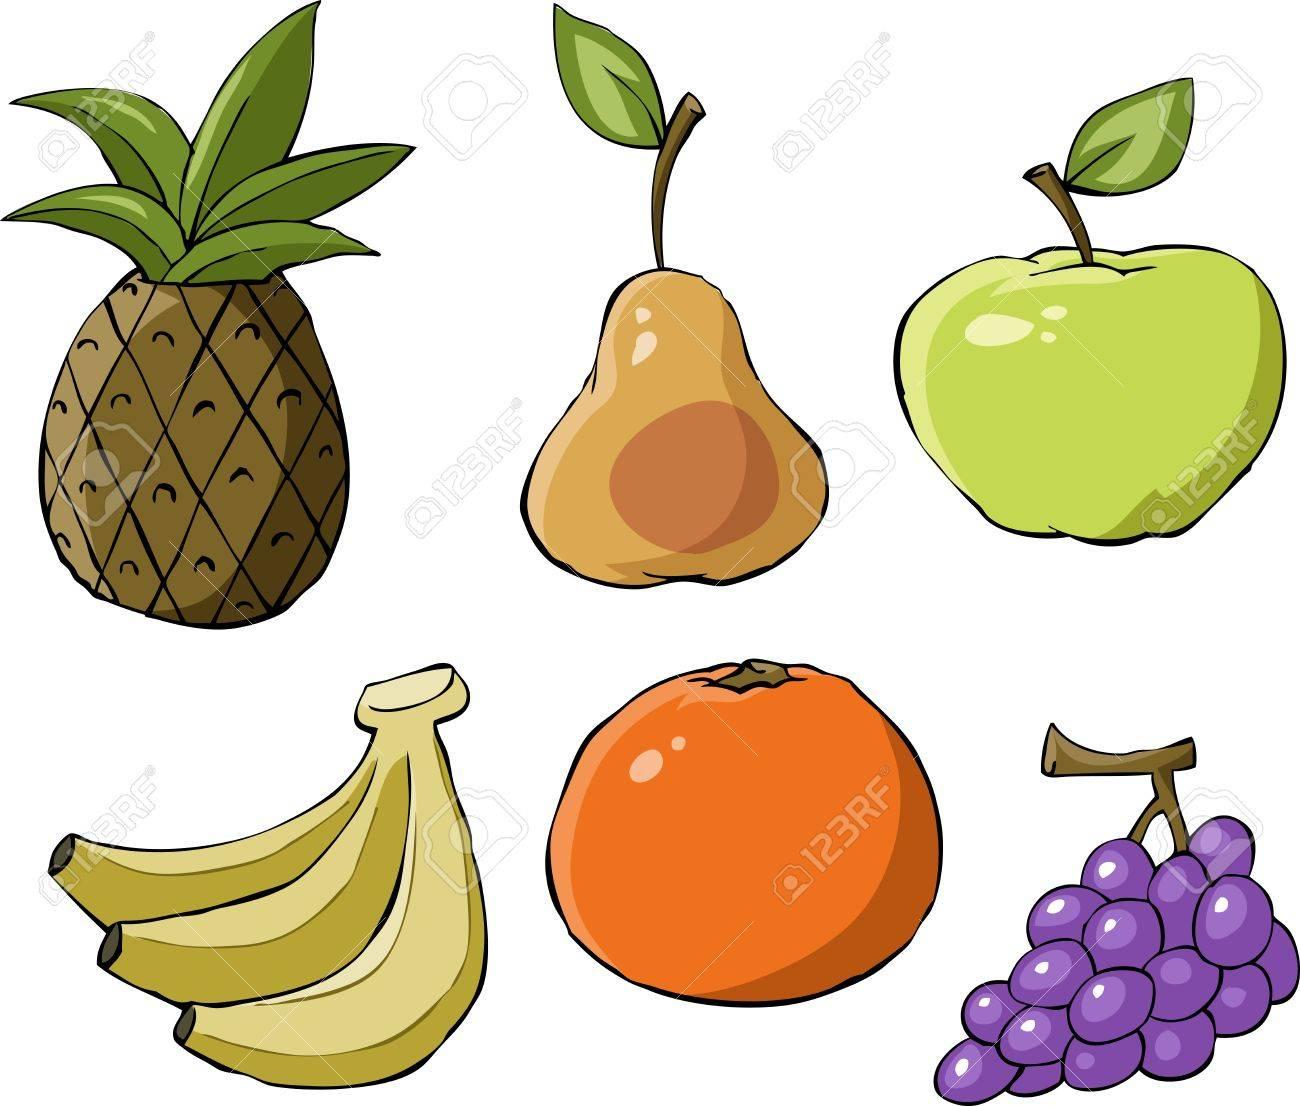 Fruit on a white background, vector illustration Stock Vector - 10525947